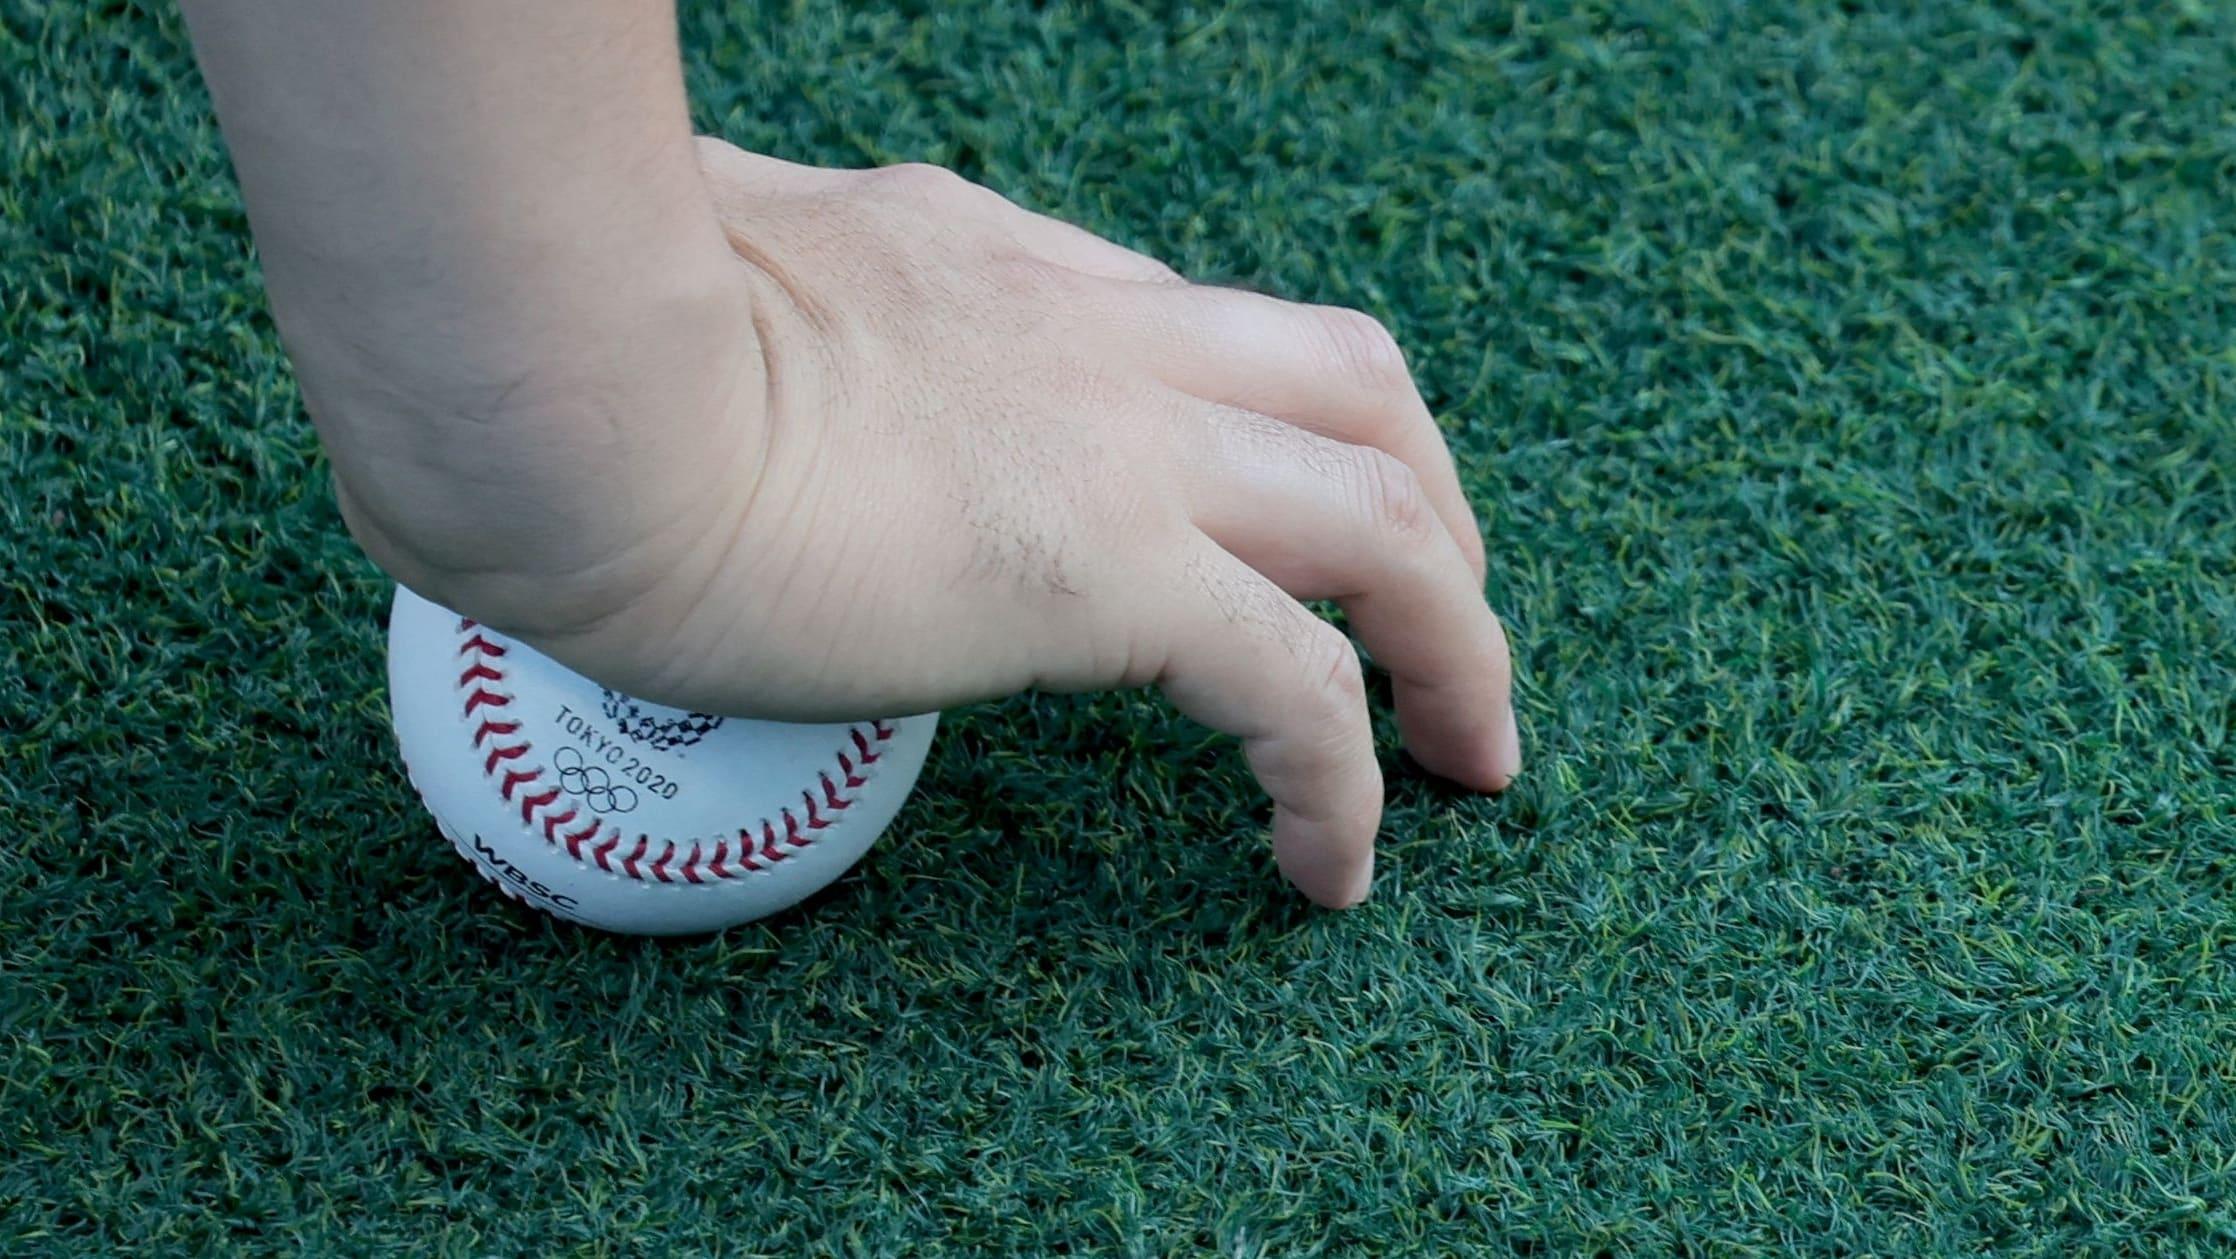 Foul-ball watchdogs sound their sirens, though few around to hear